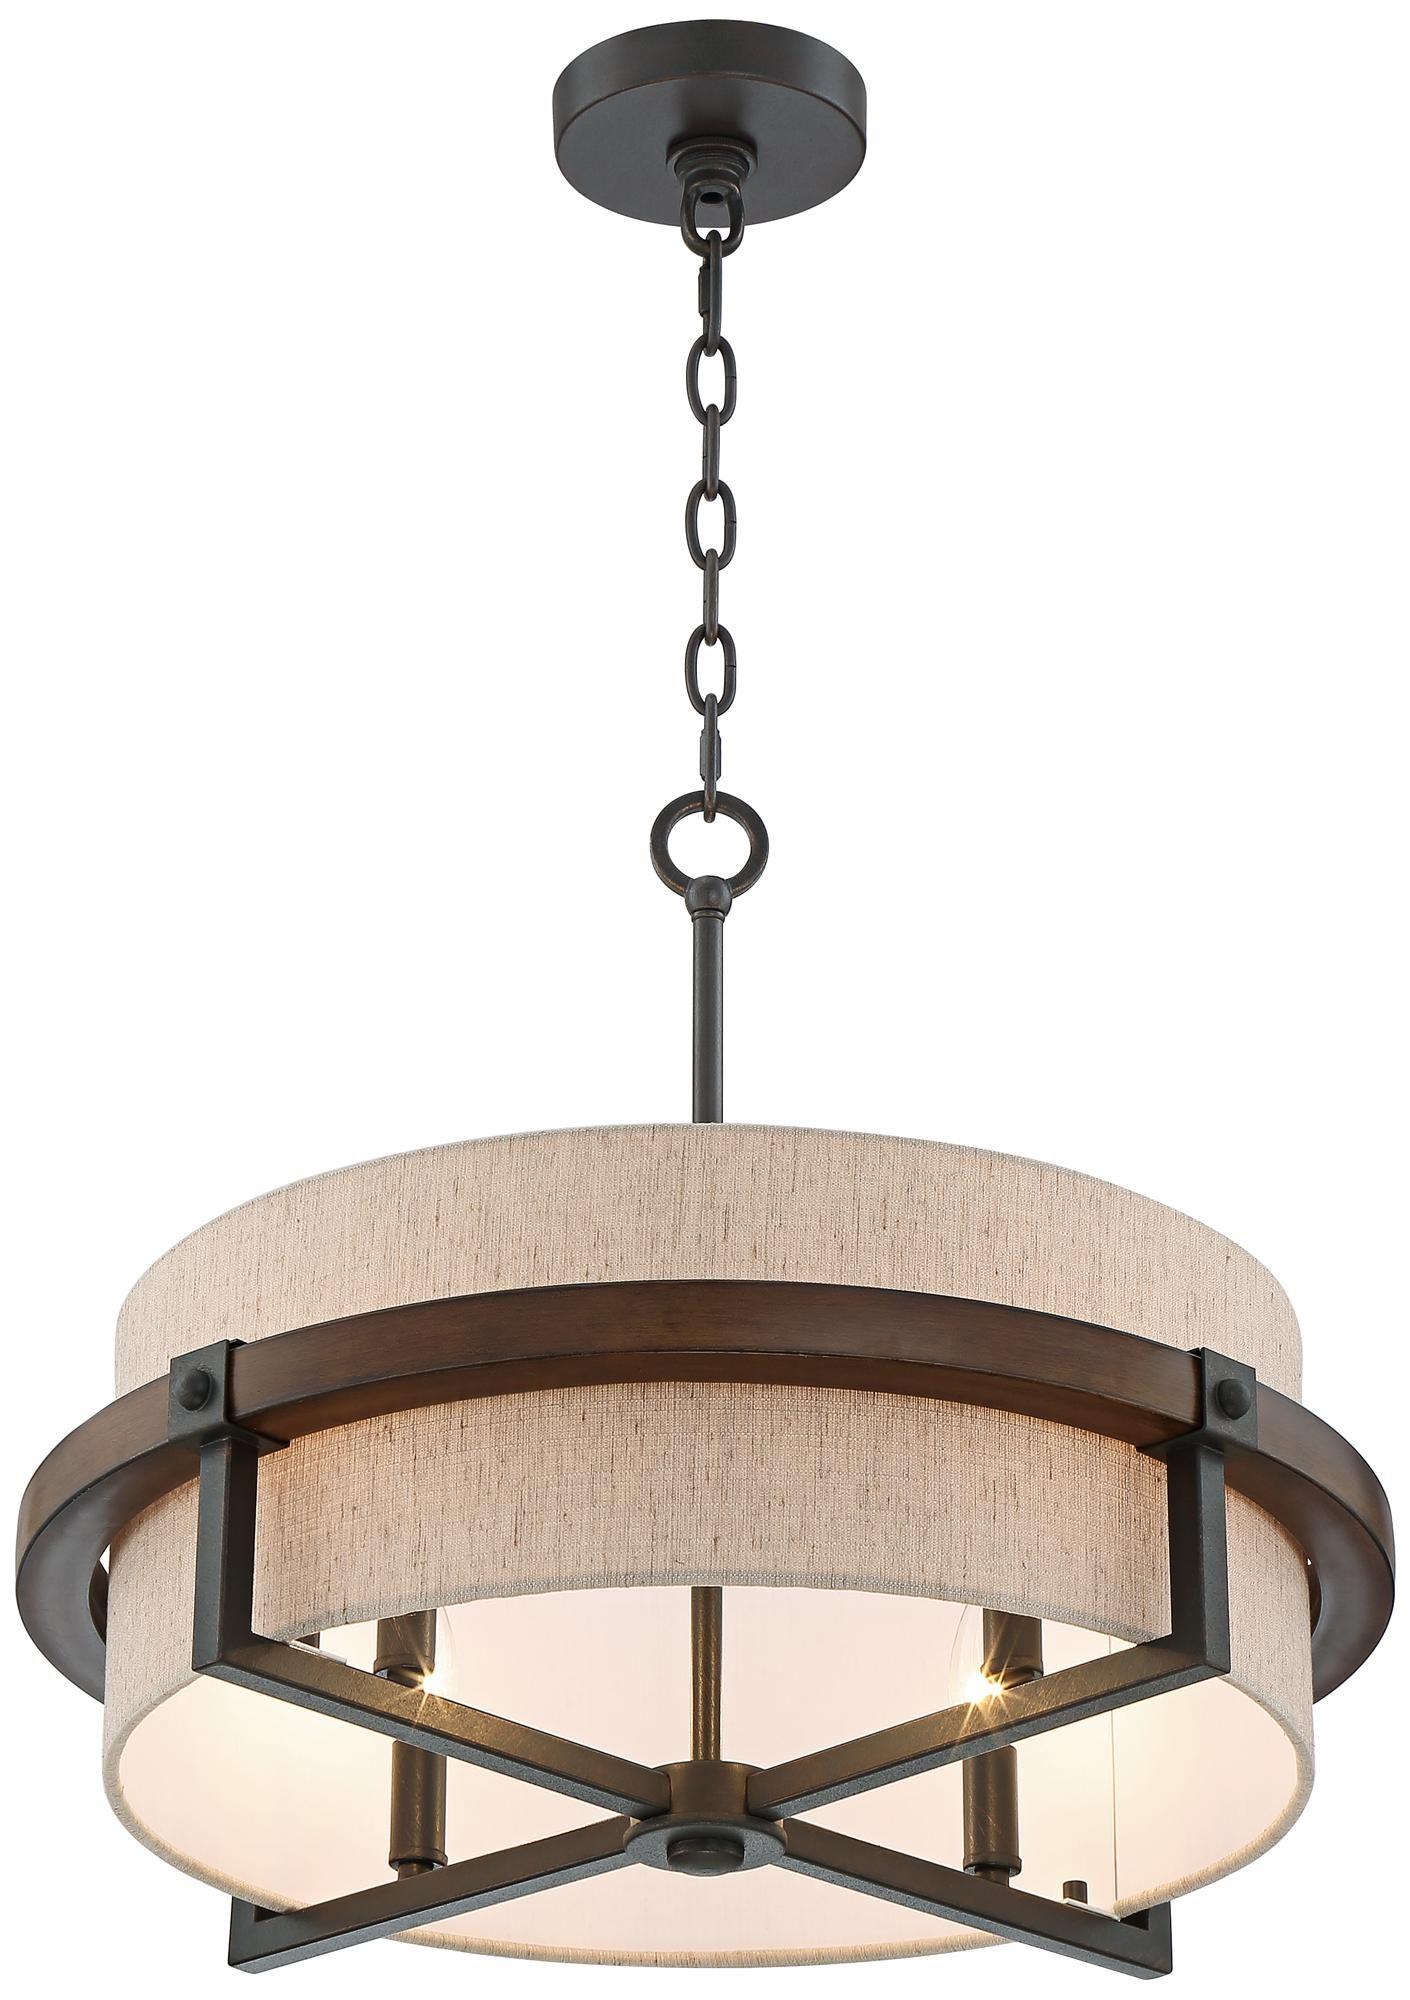 Castille 22 Wide Bronze Pendant Light 1g894 Lamps Plus Bronze Pendant Light Pendant Light Bronze Pendant